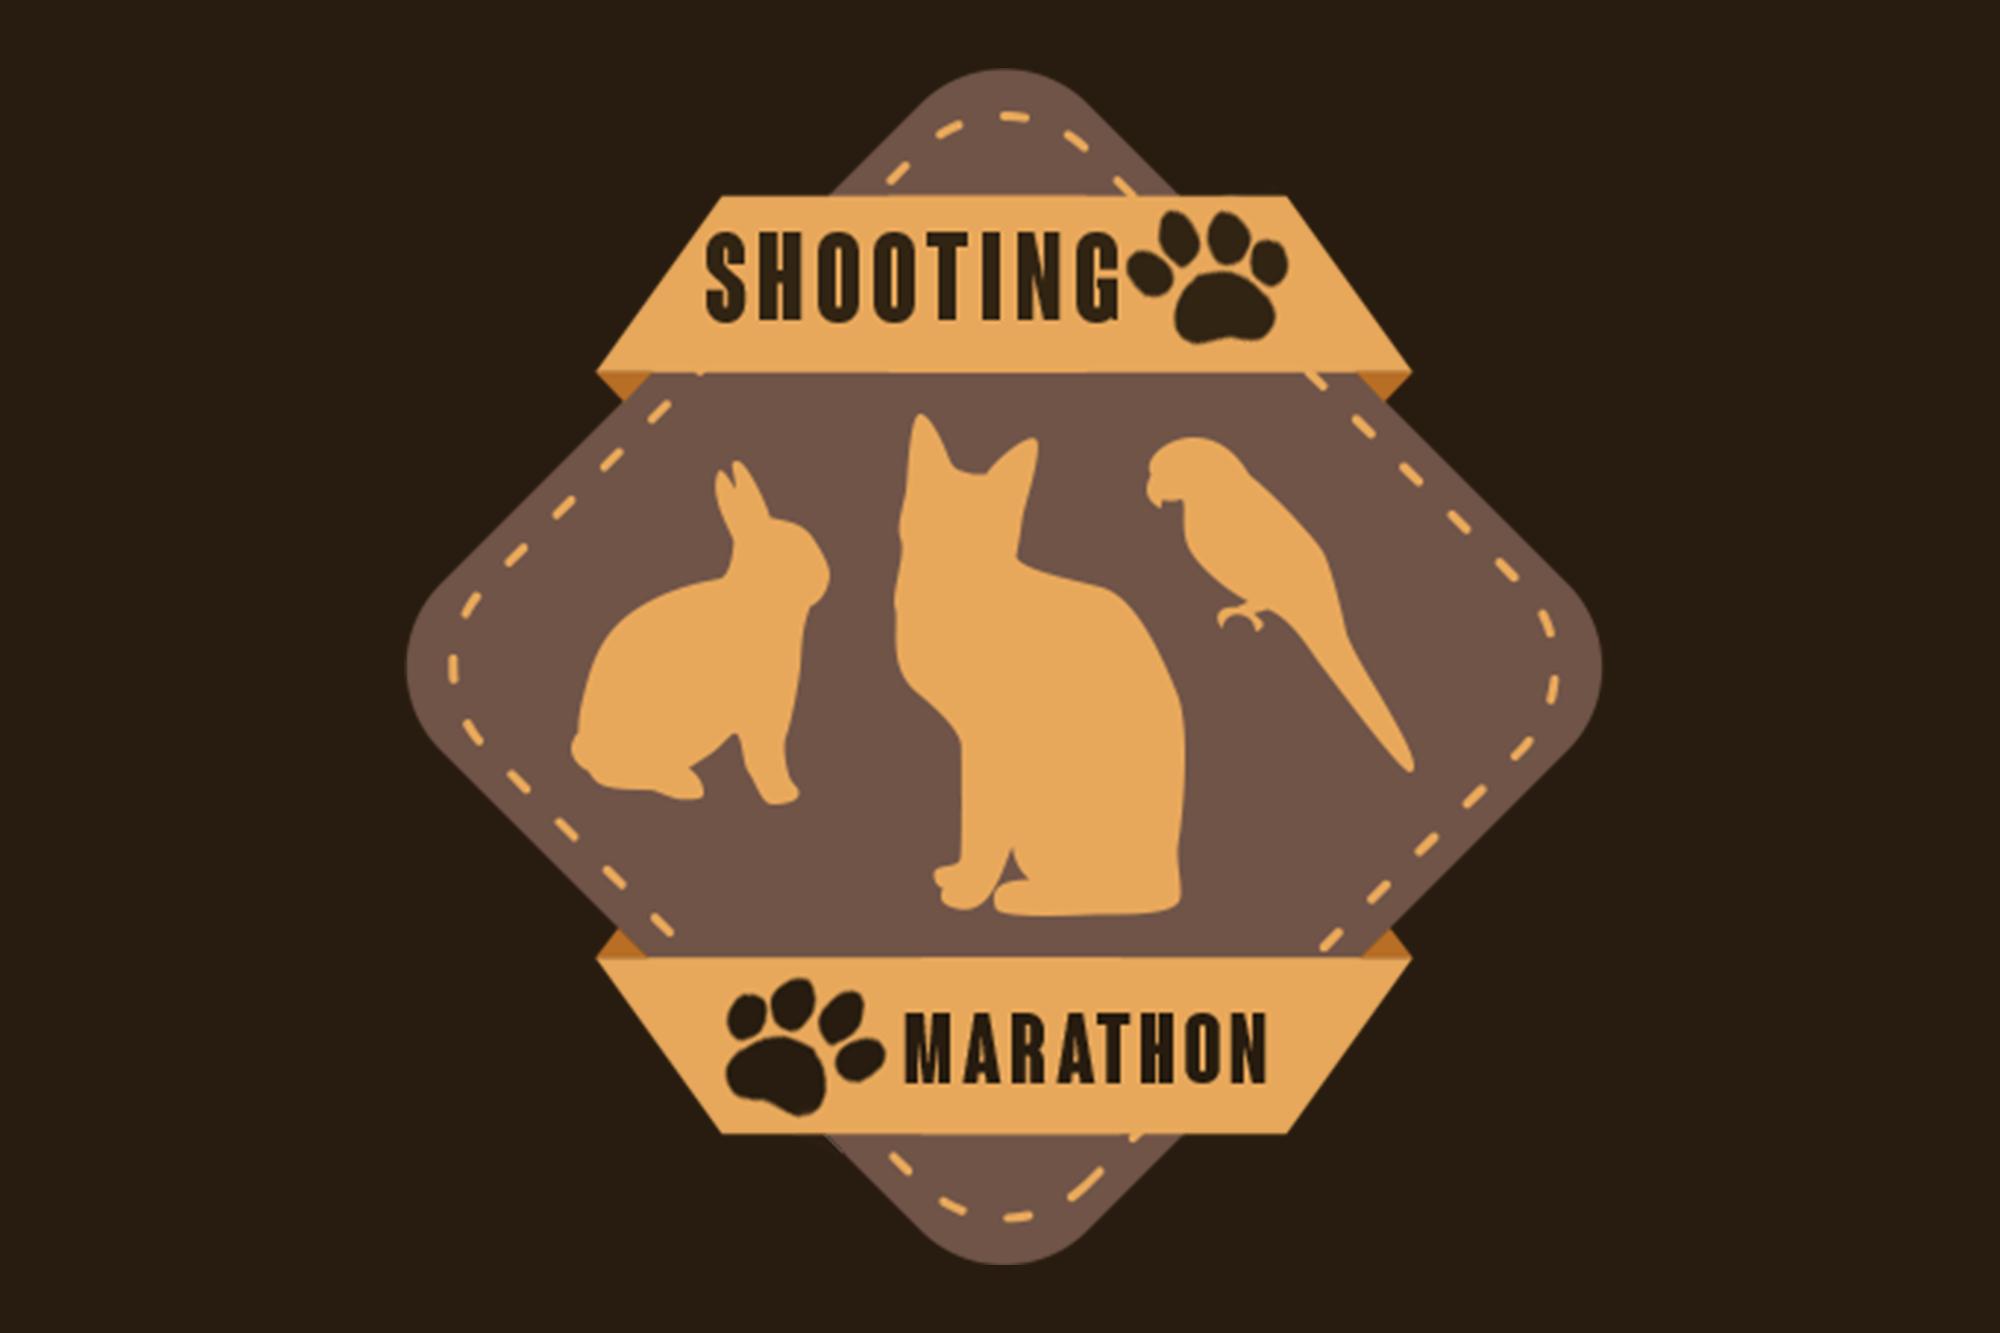 Shooting Marathon 2021